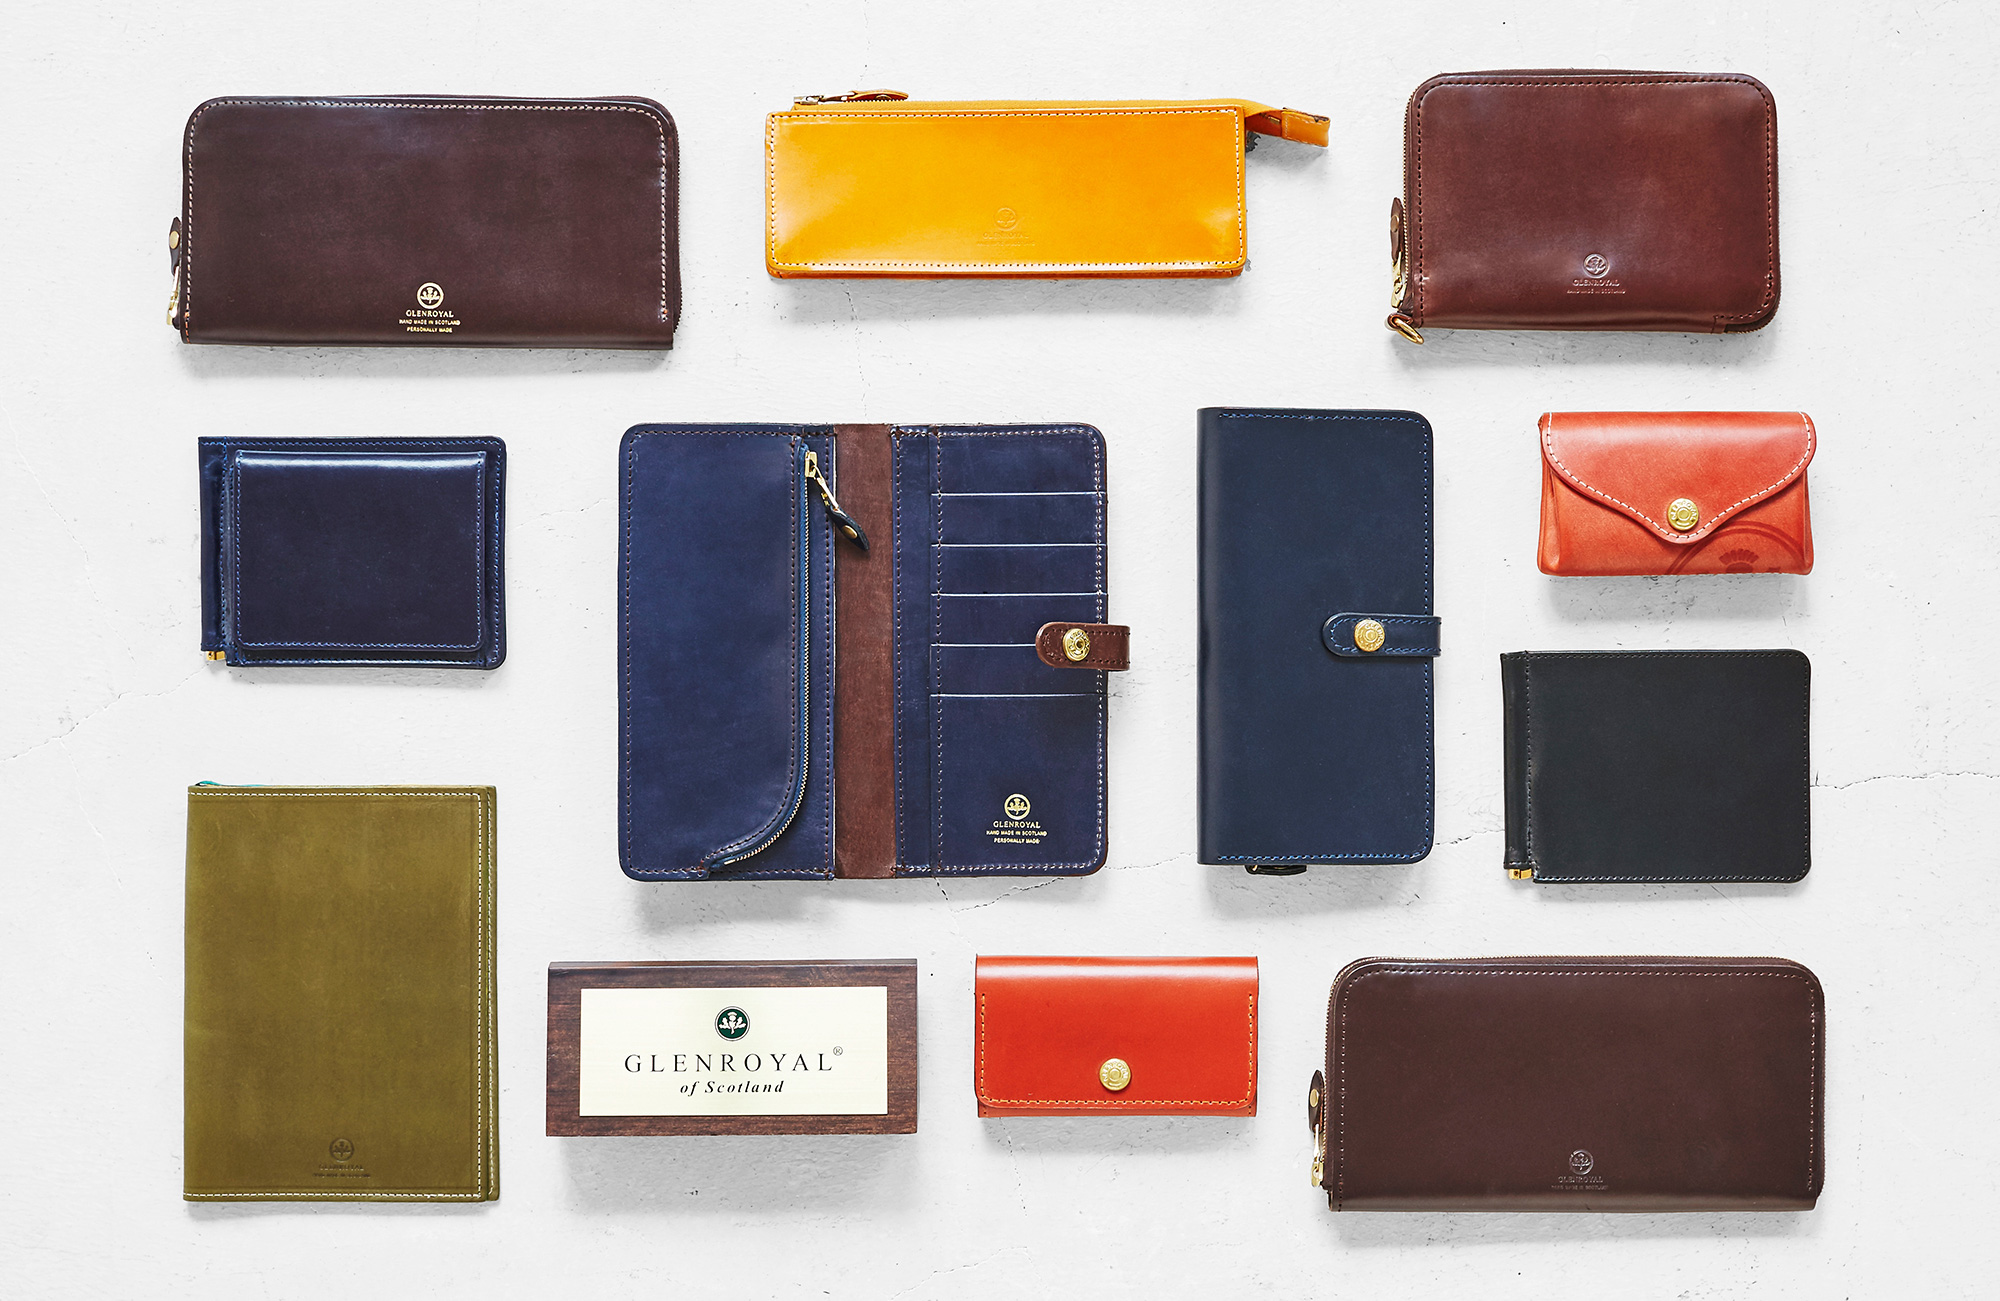 GLENROYAL メンズ財布